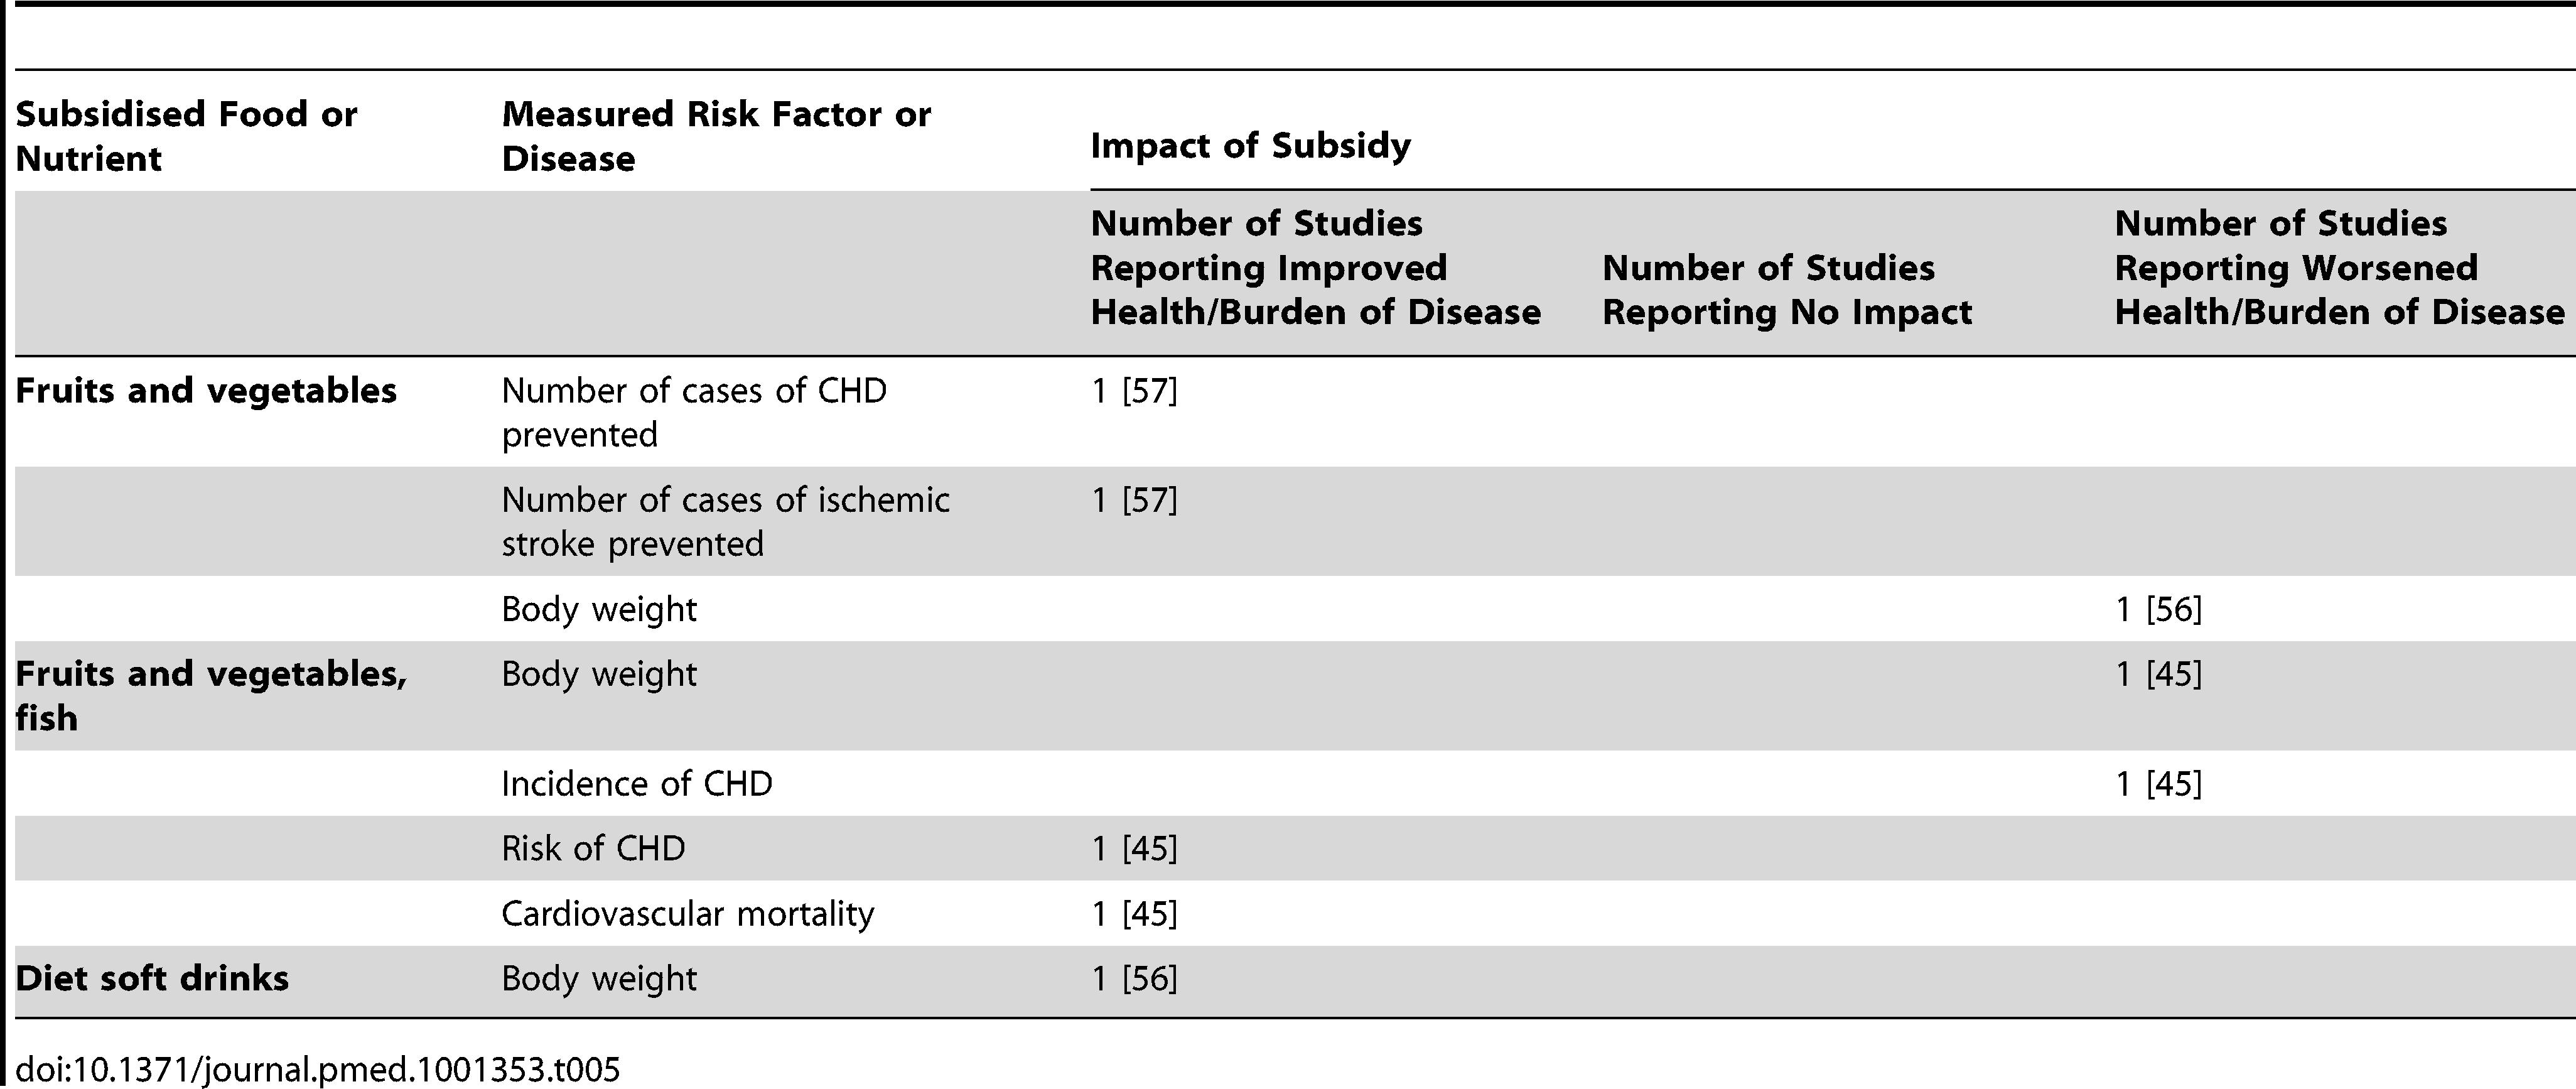 Summary of simulation modelling studies assessing the impact of subsidies on health/disease (<i>n</i>=3 studies).